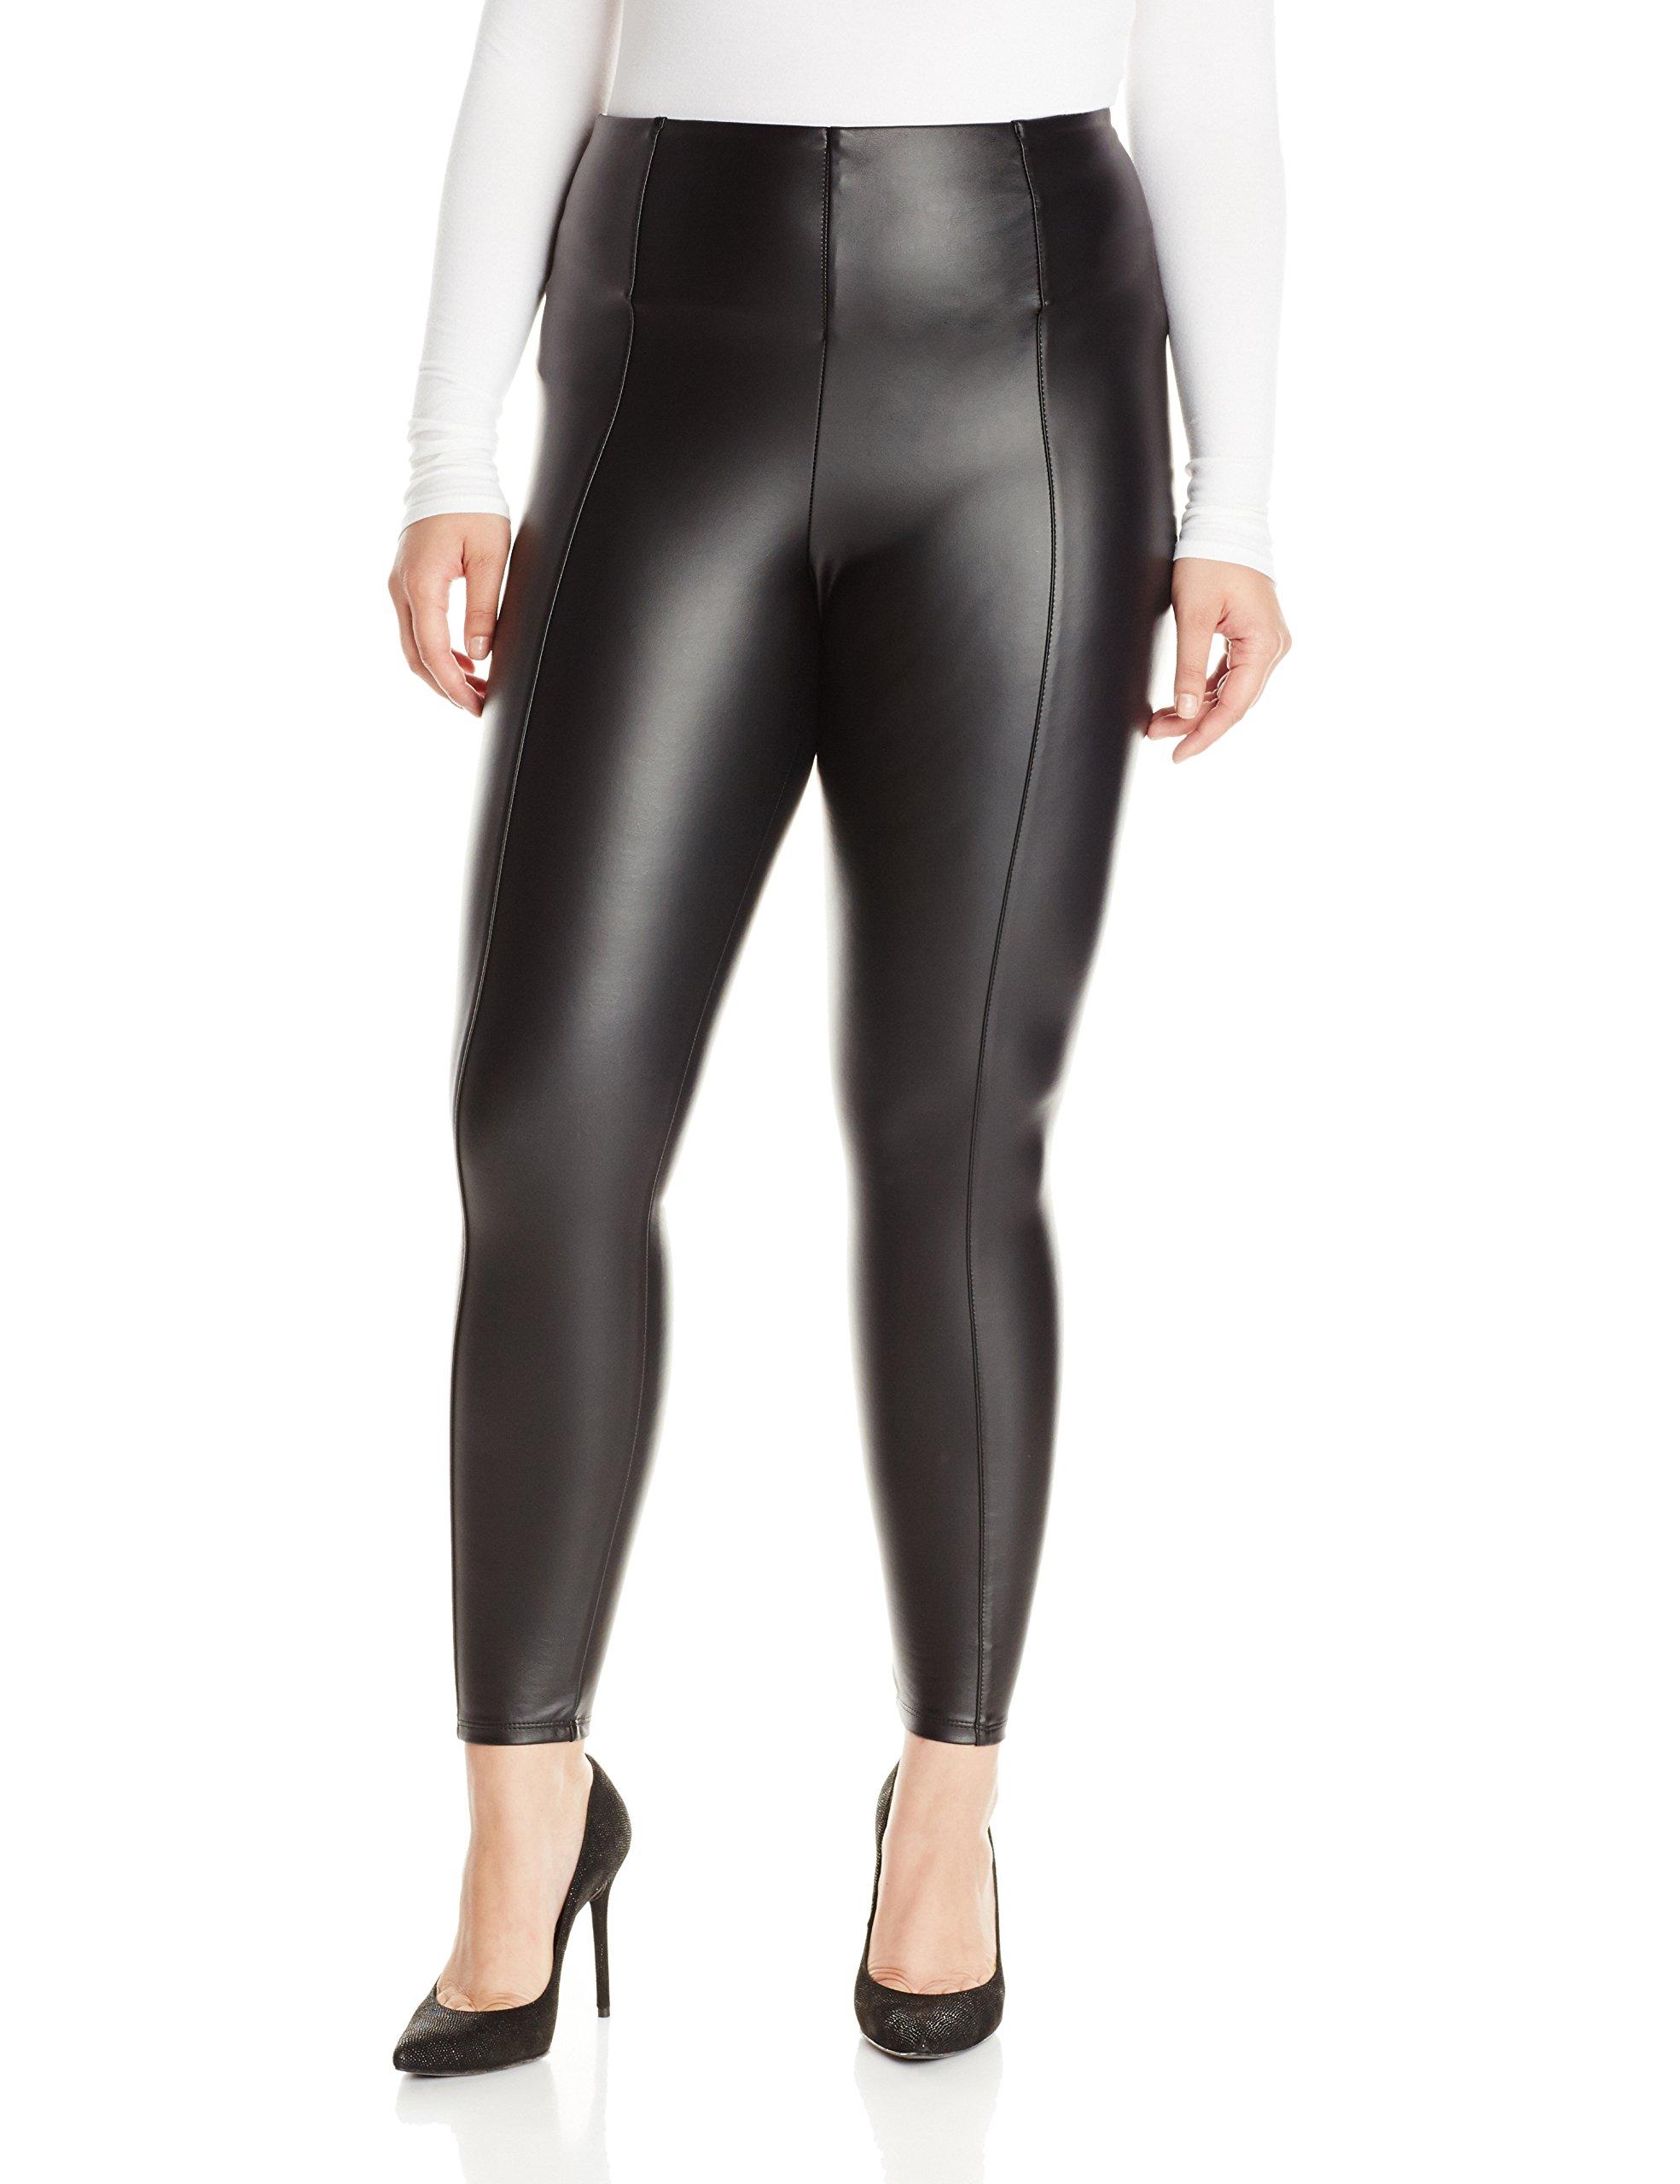 Lyssé Women's Plus Size Hi Waist Vegan Legging, Black 1X